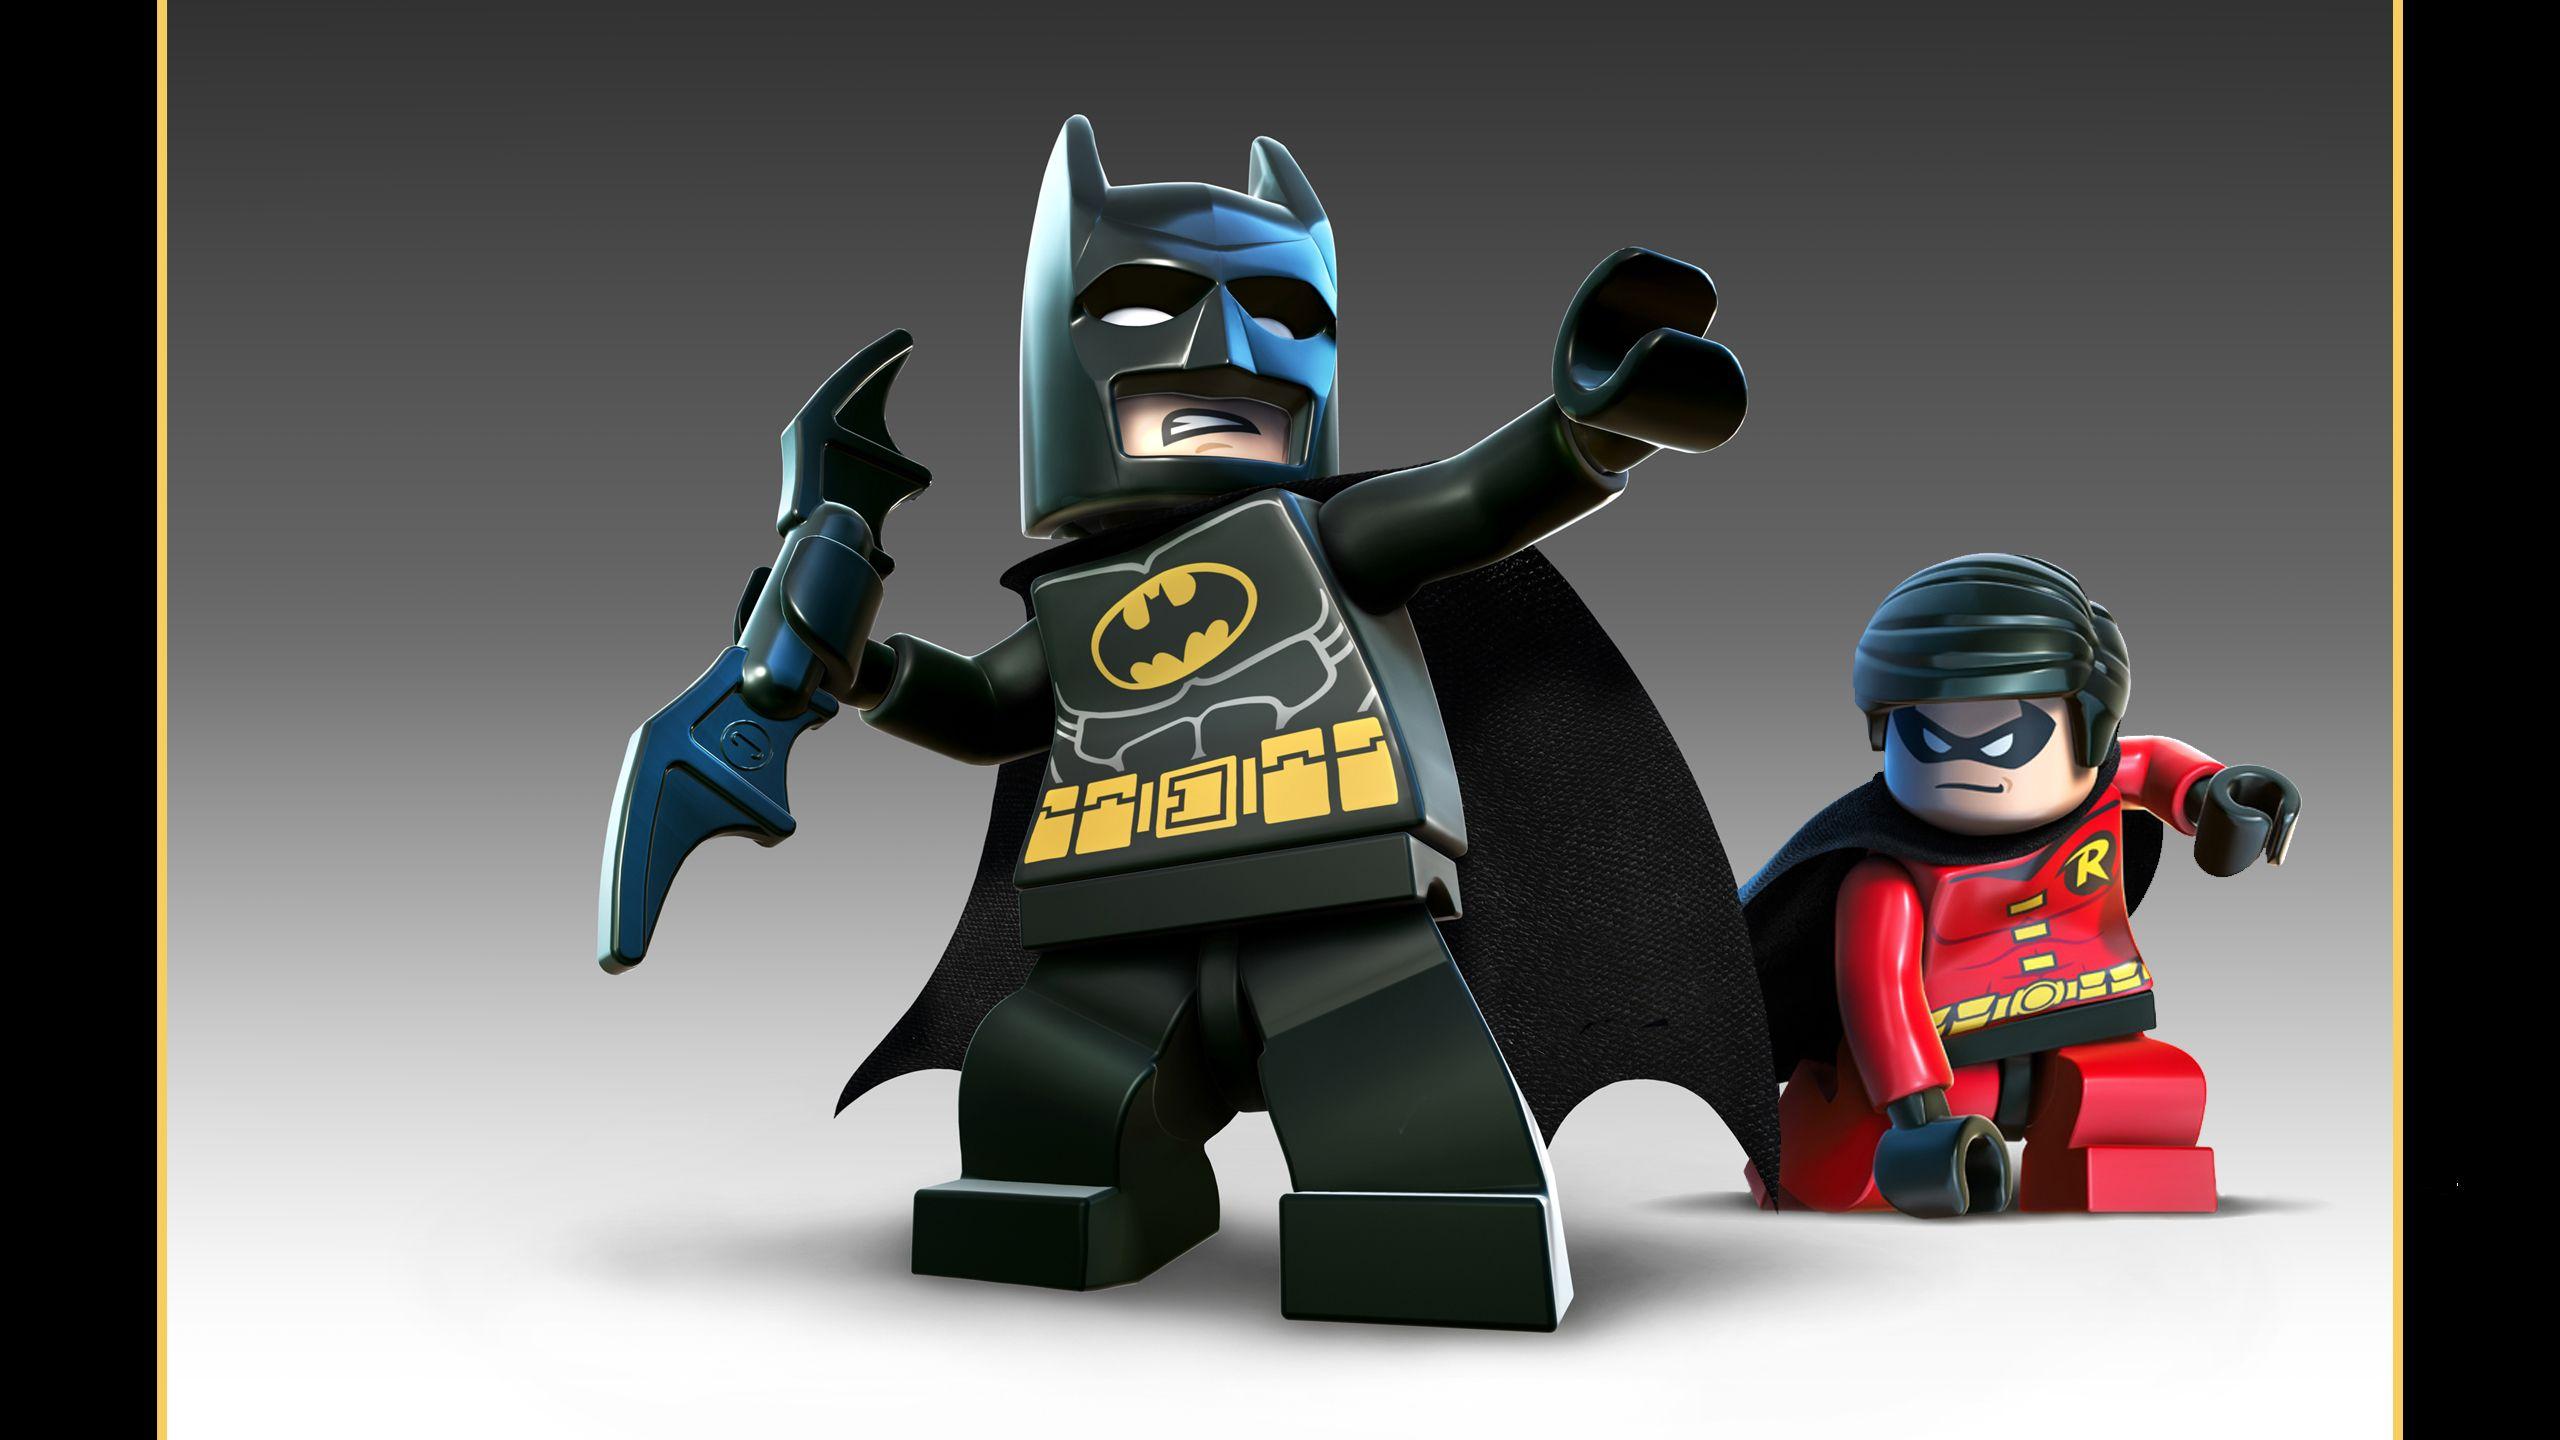 Revel in the Lego-ness!